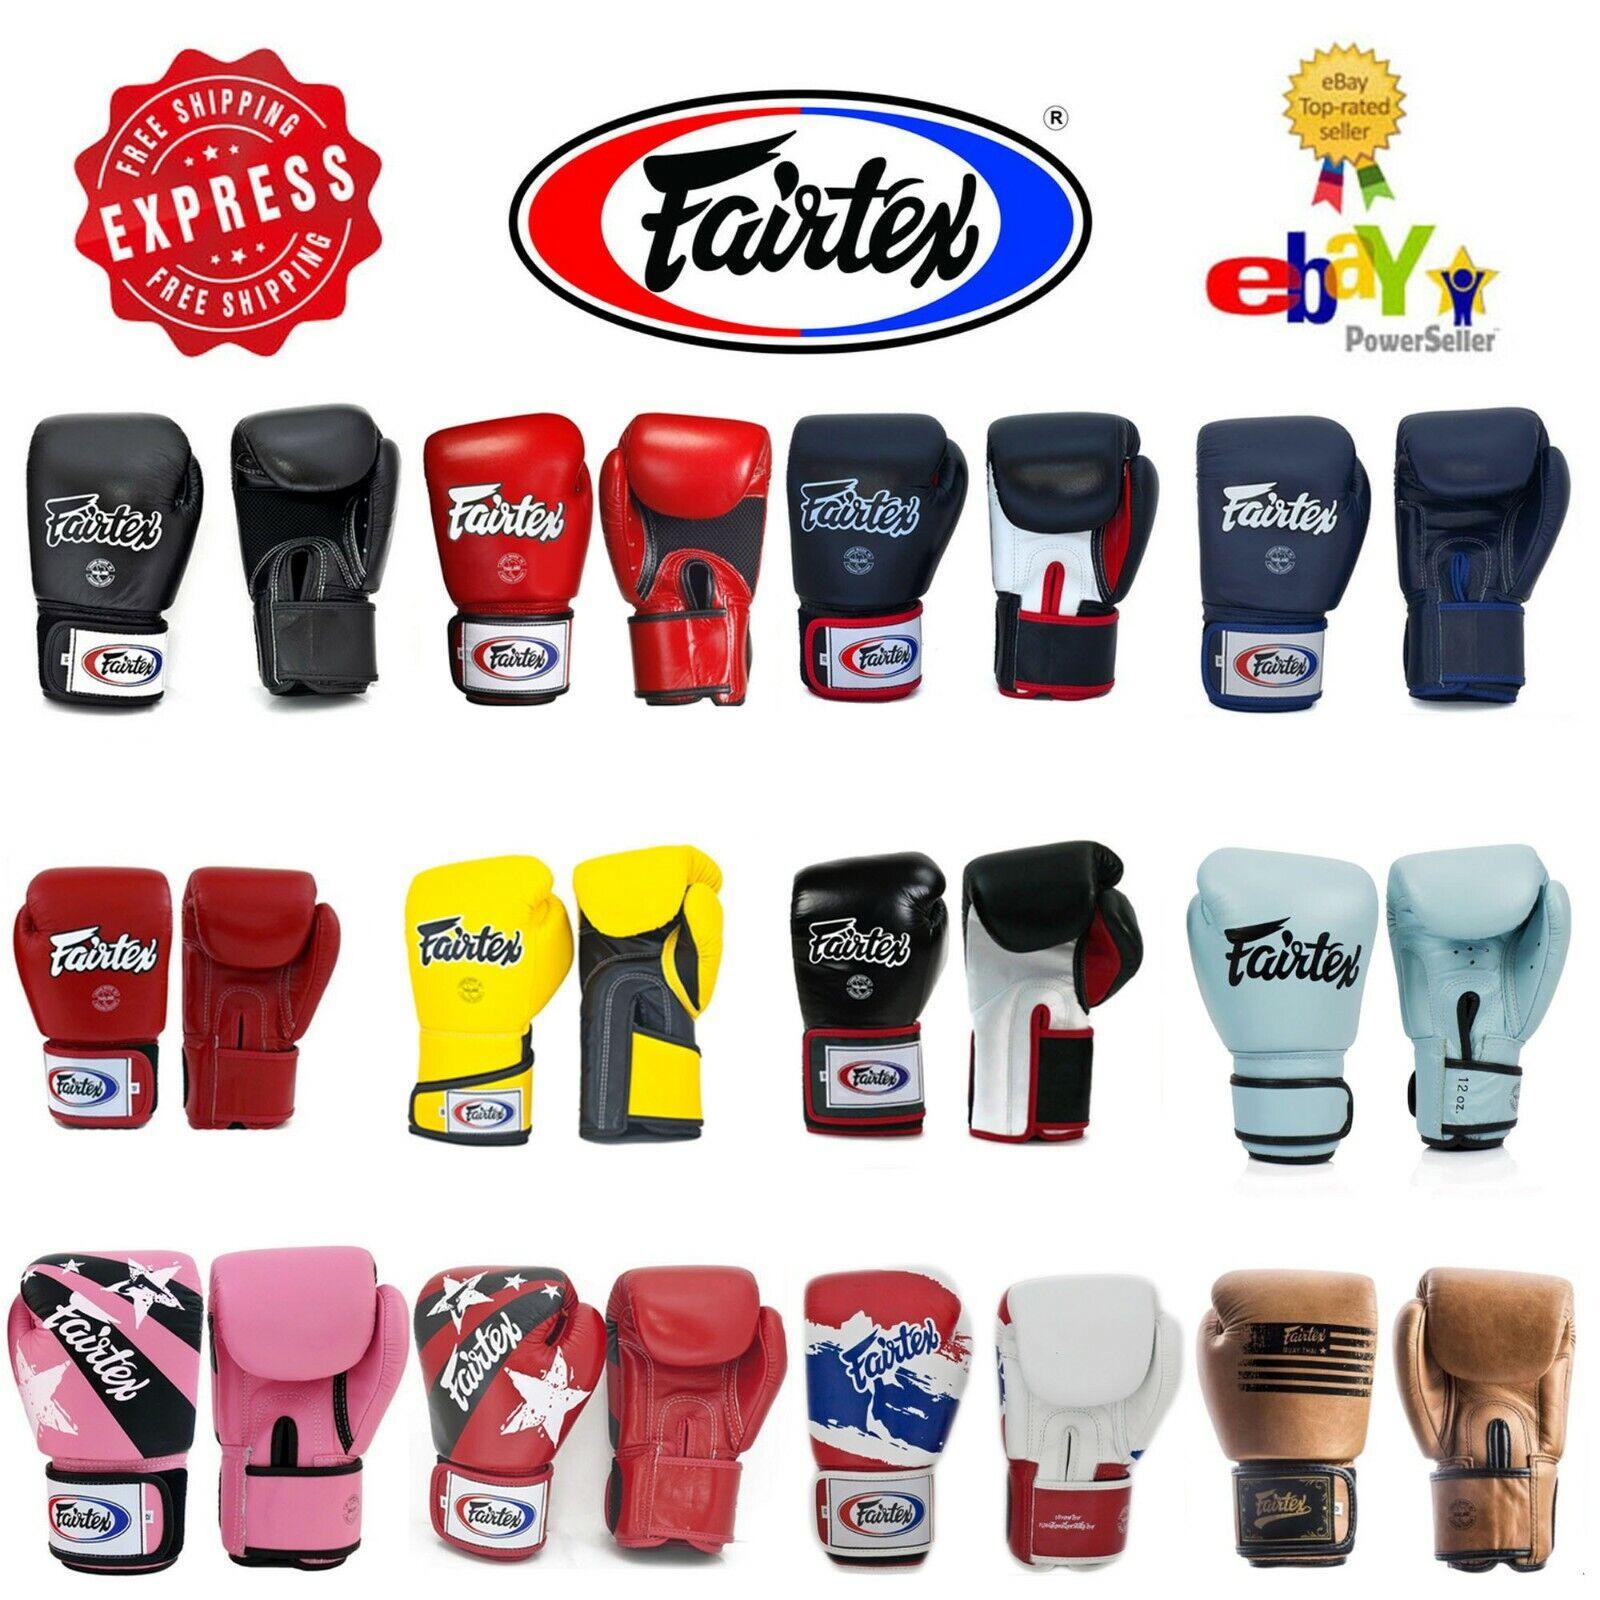 FAIRTEX MUAY THAI KICK BOXING MMA GLOVES BGV9 WHITE BLACK RED TRAINING MEXICAN